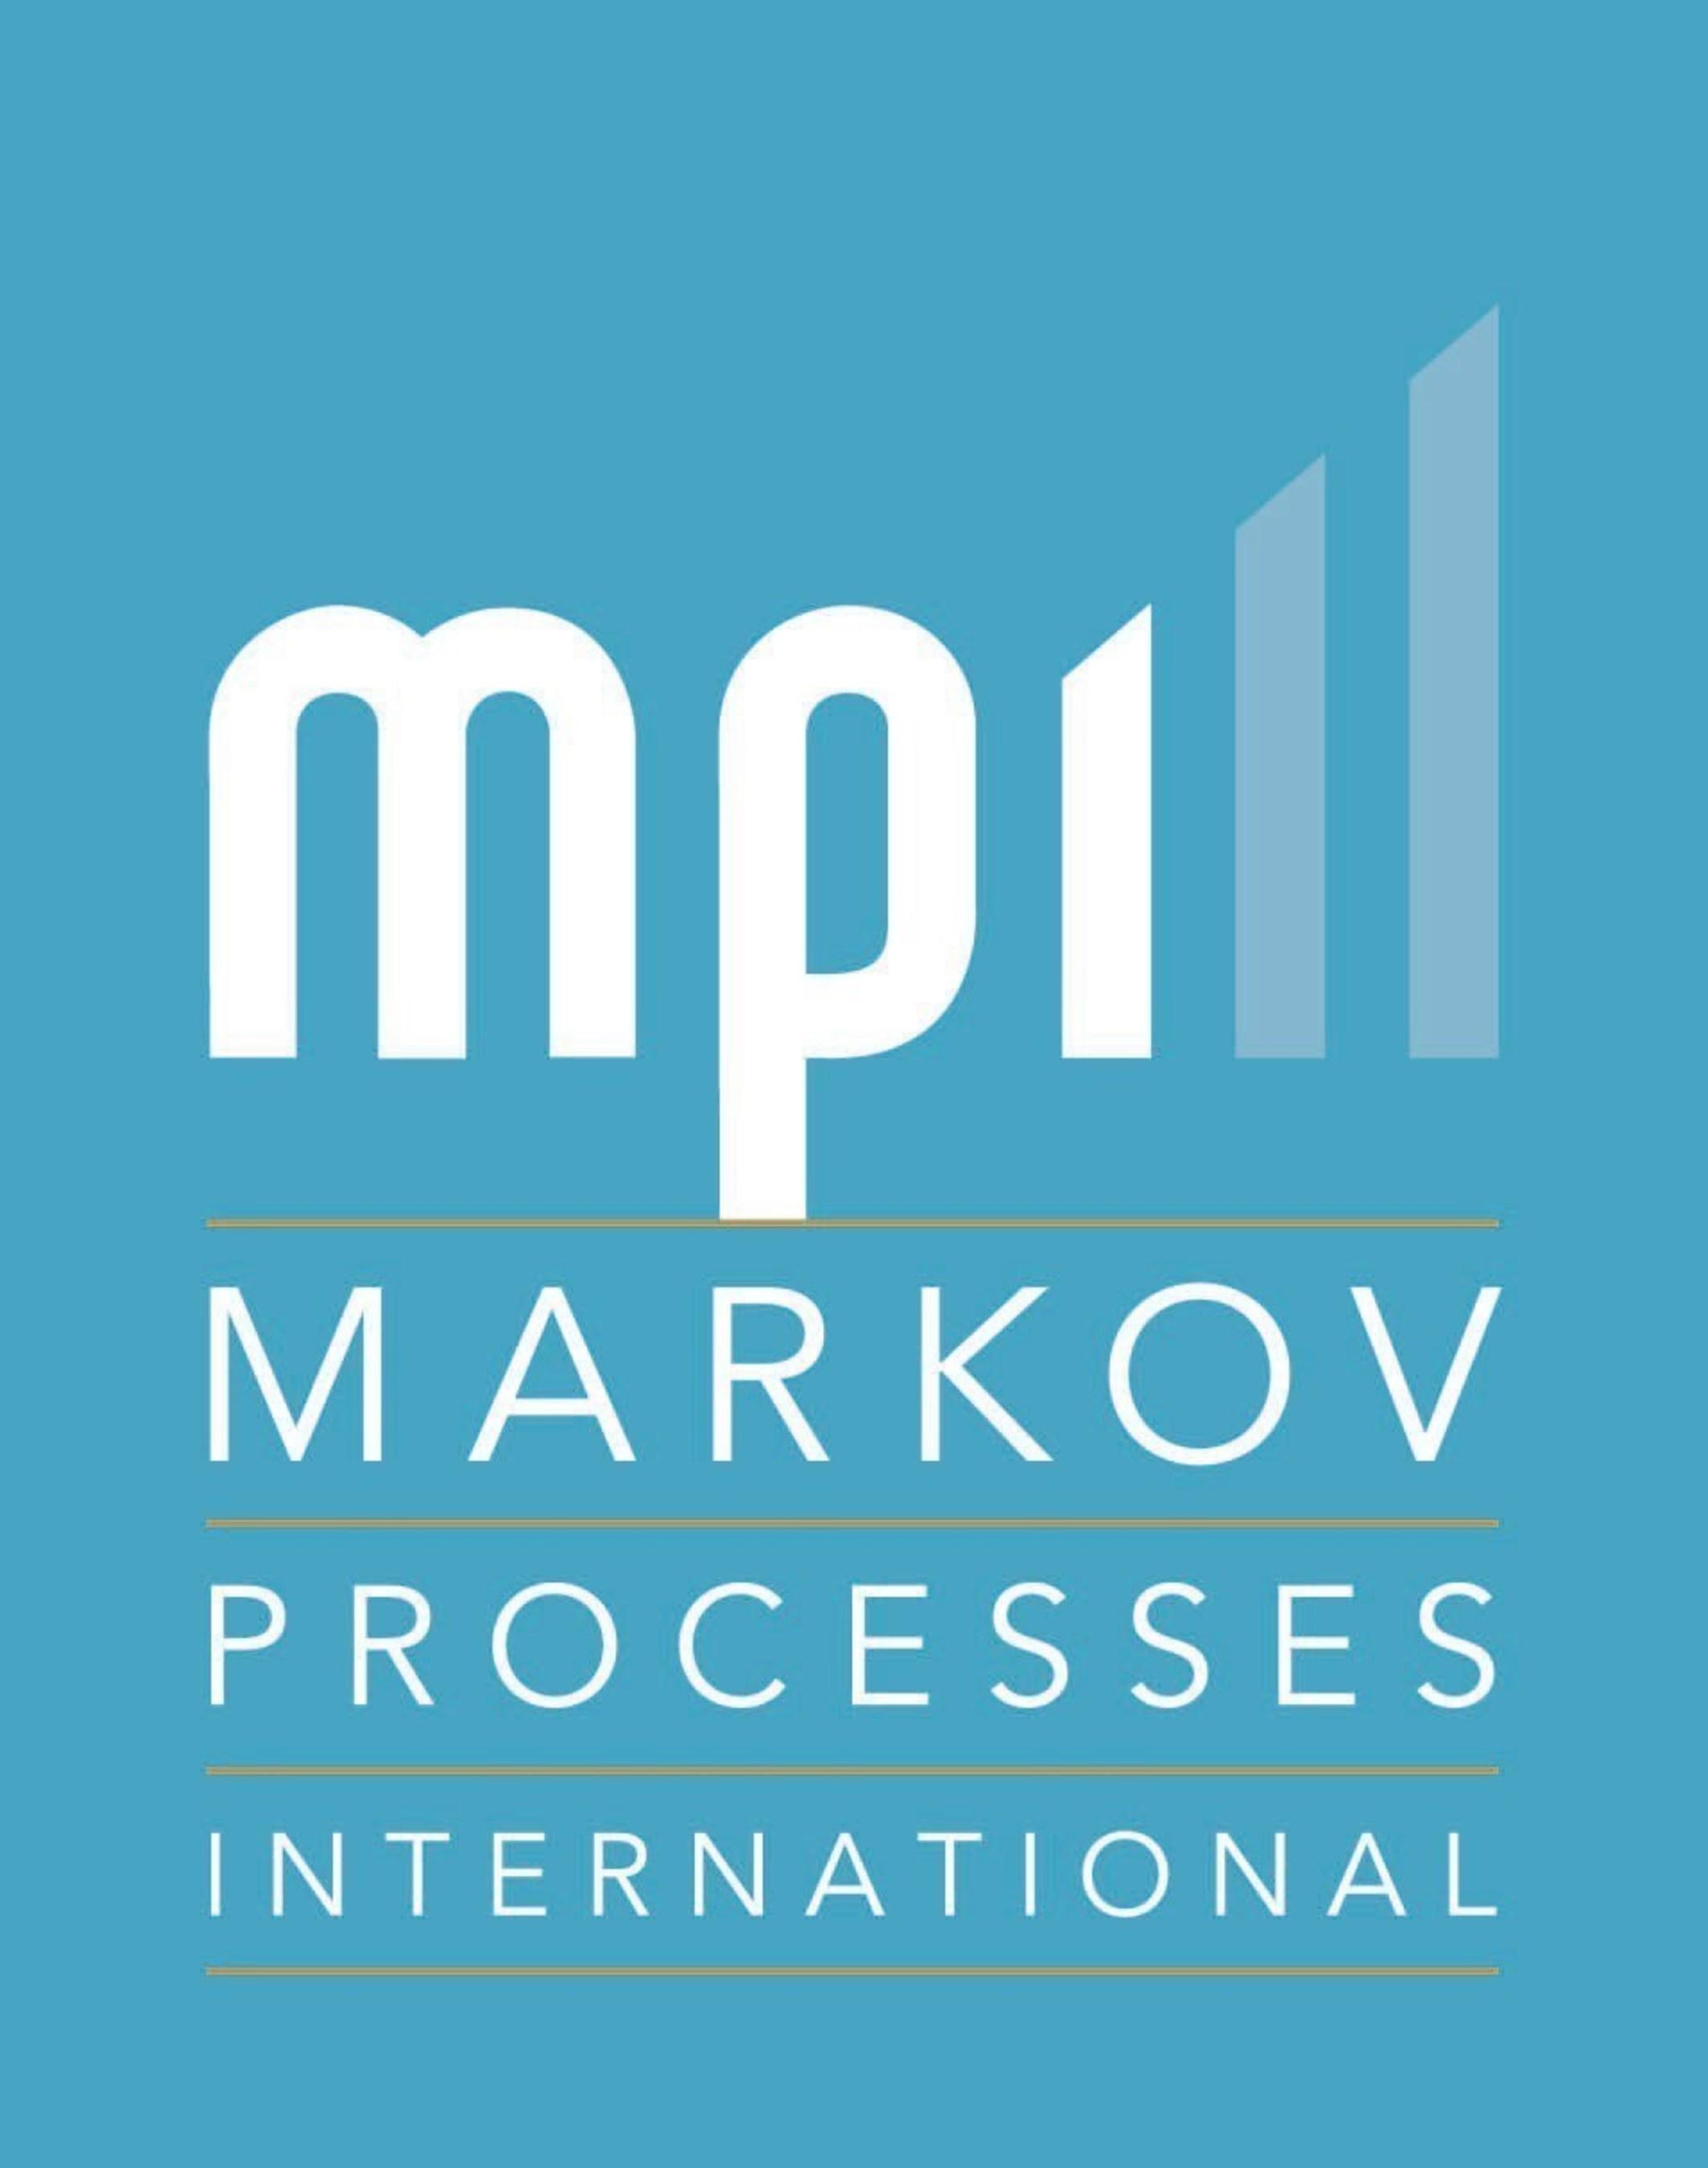 MPI's Factor Analysis Reveals Key Trends Behind SLI GARS Performance